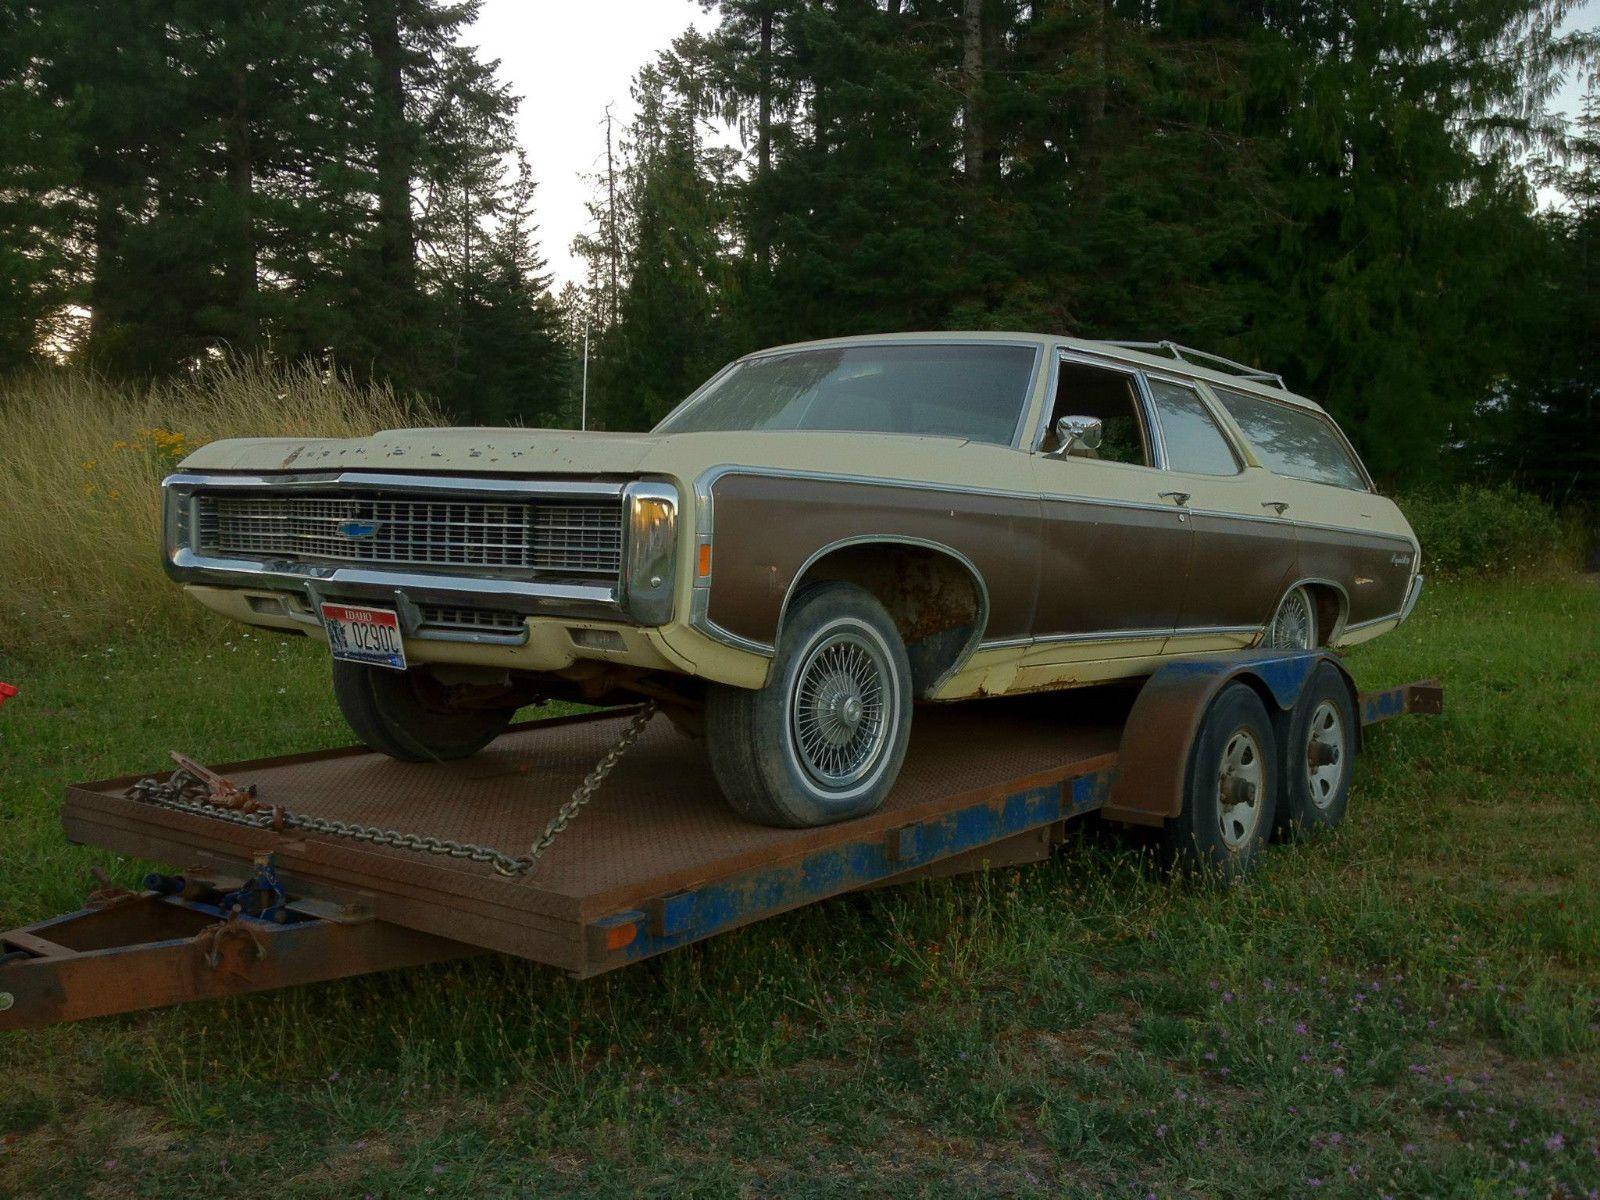 69 1969 Caprice Kingswood Estate Wagon Hideaway Headlights Bbc 9